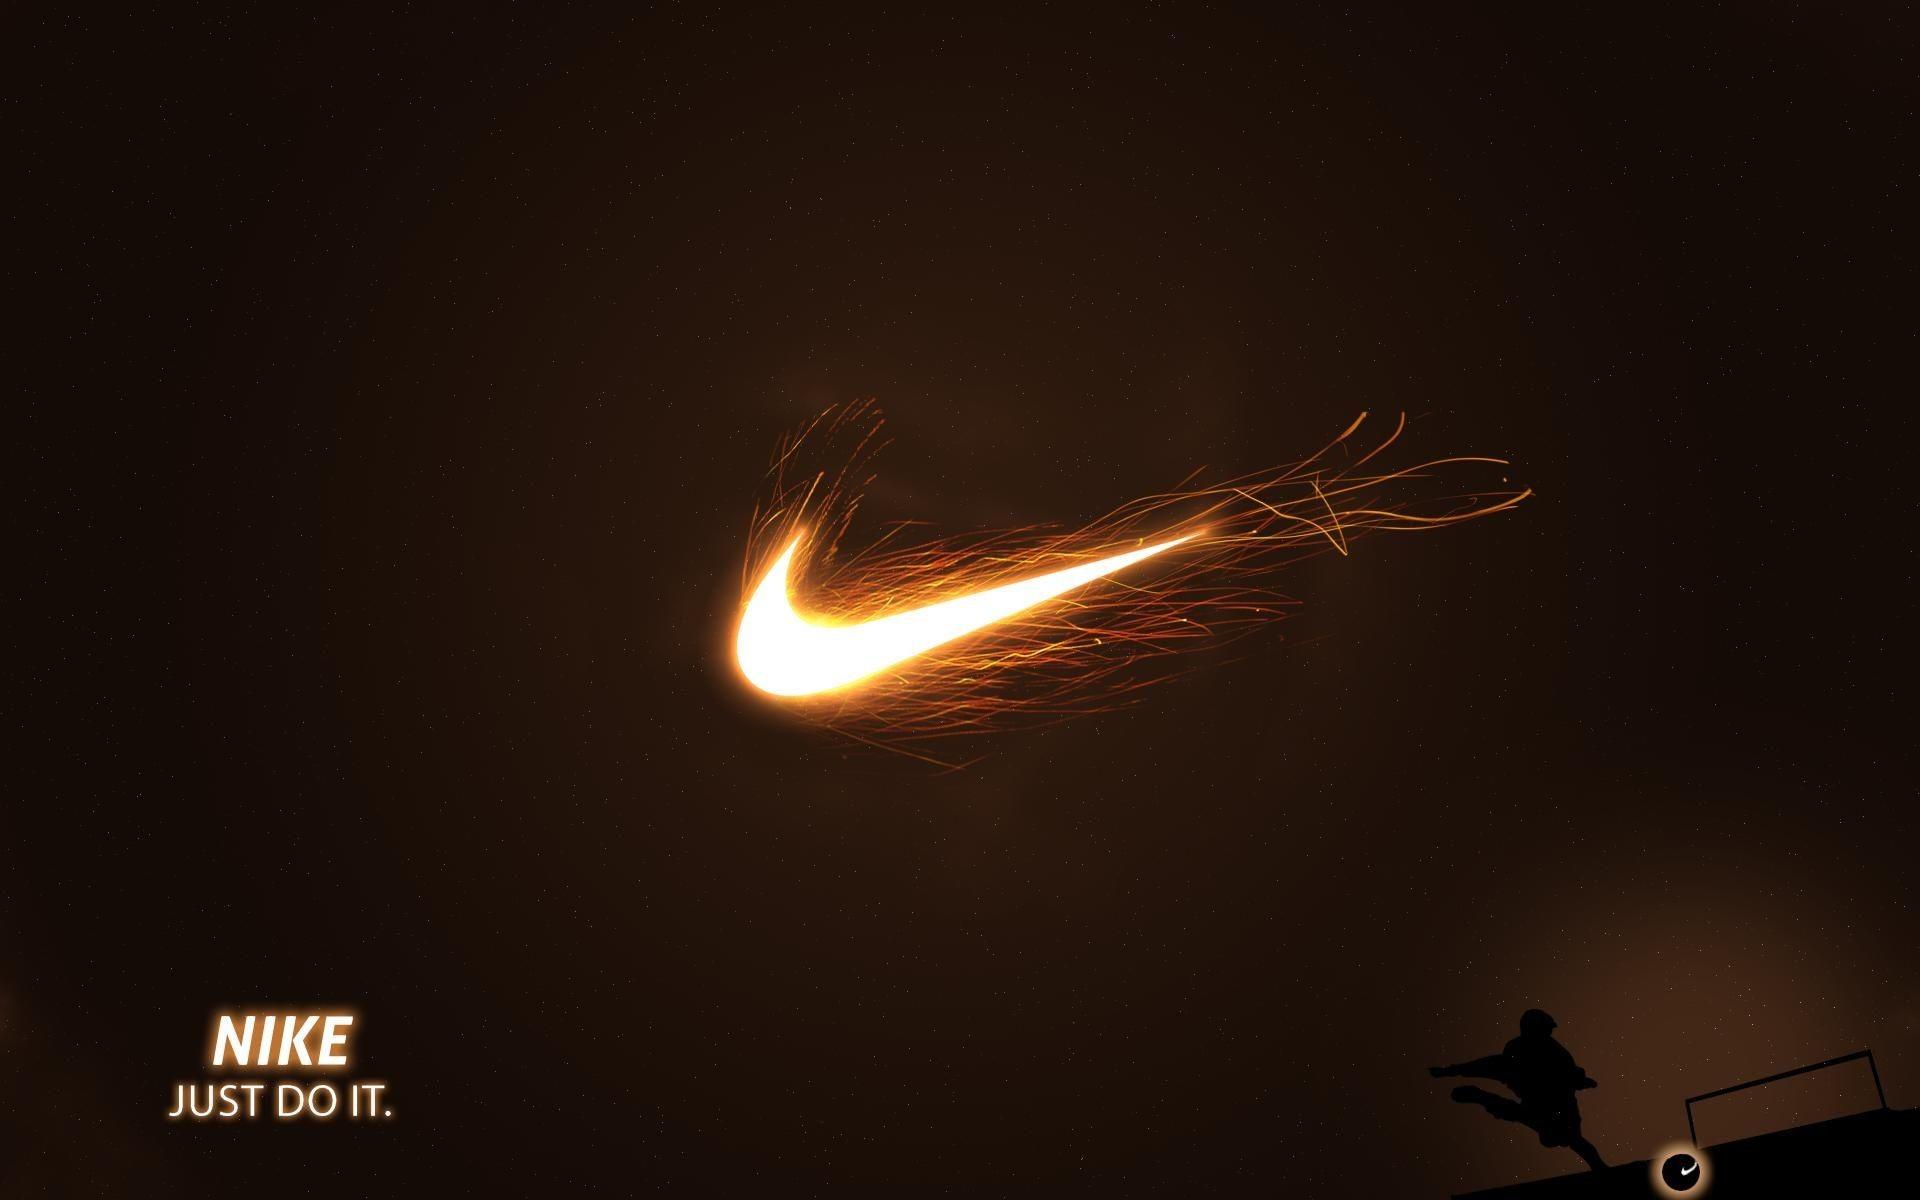 Nike Wallpaper 69 Images